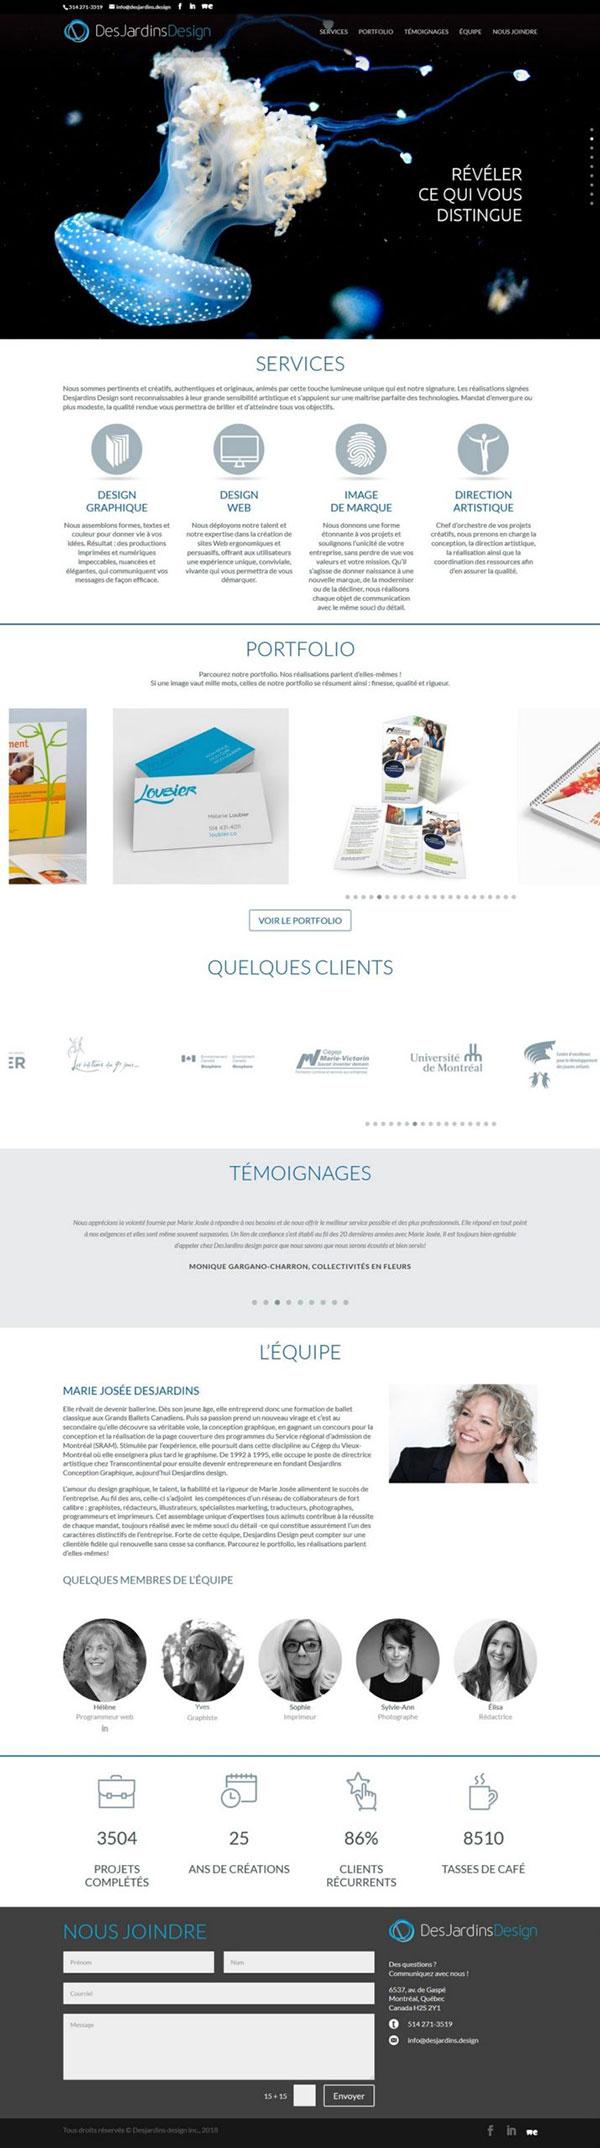 Site Web Desjardins-Design 2019 - Progexia Solutions Web